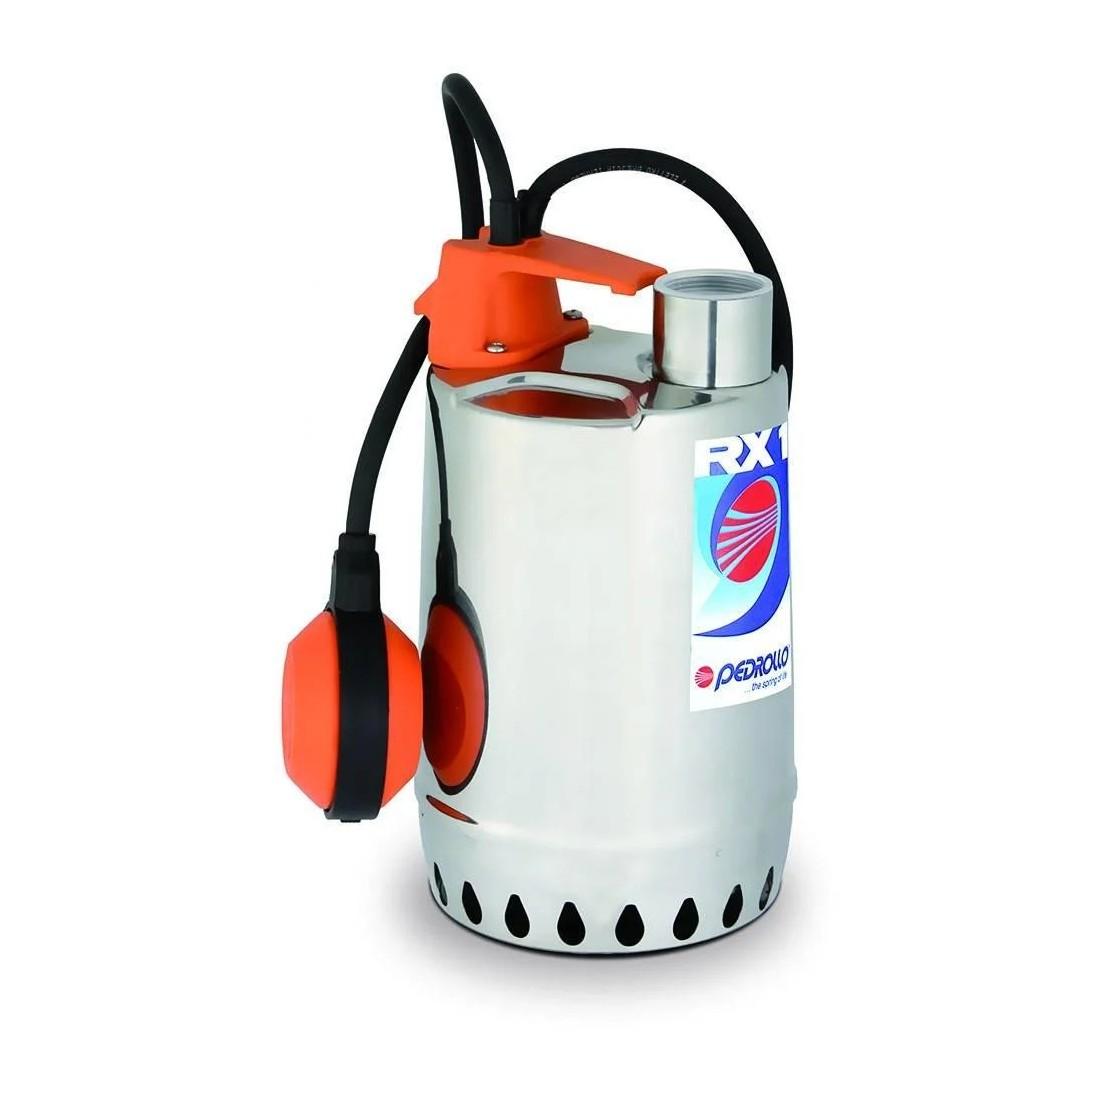 Pompa submersibila apa usor murdara cu plutitor magnetic Pedrollo RXm 4-GM monofazata